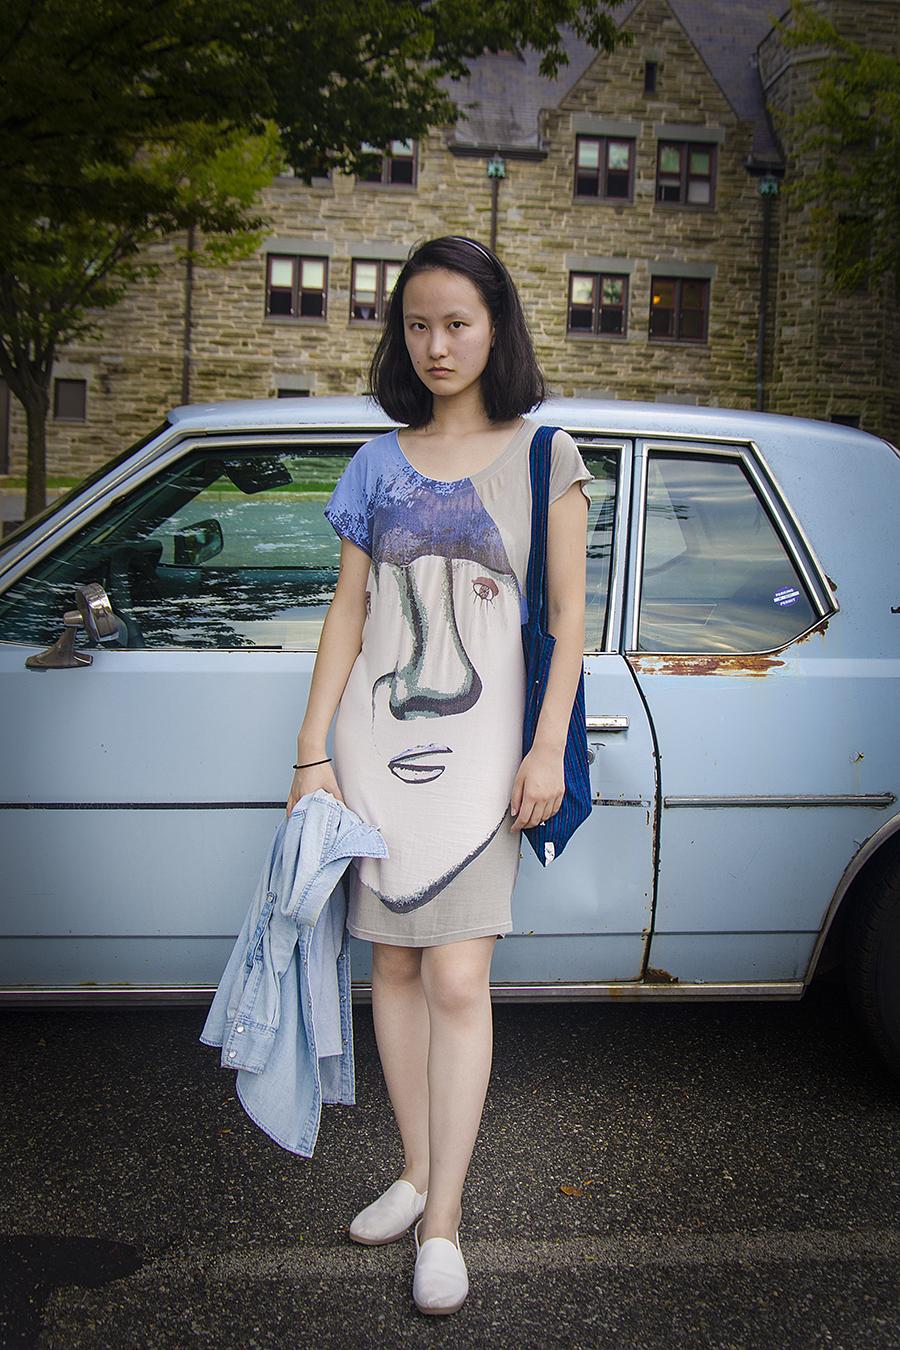 Jingwen_Felix_Qiang_Photography_Beth_Tang_Blue_Dress_Environmental_Portraiture